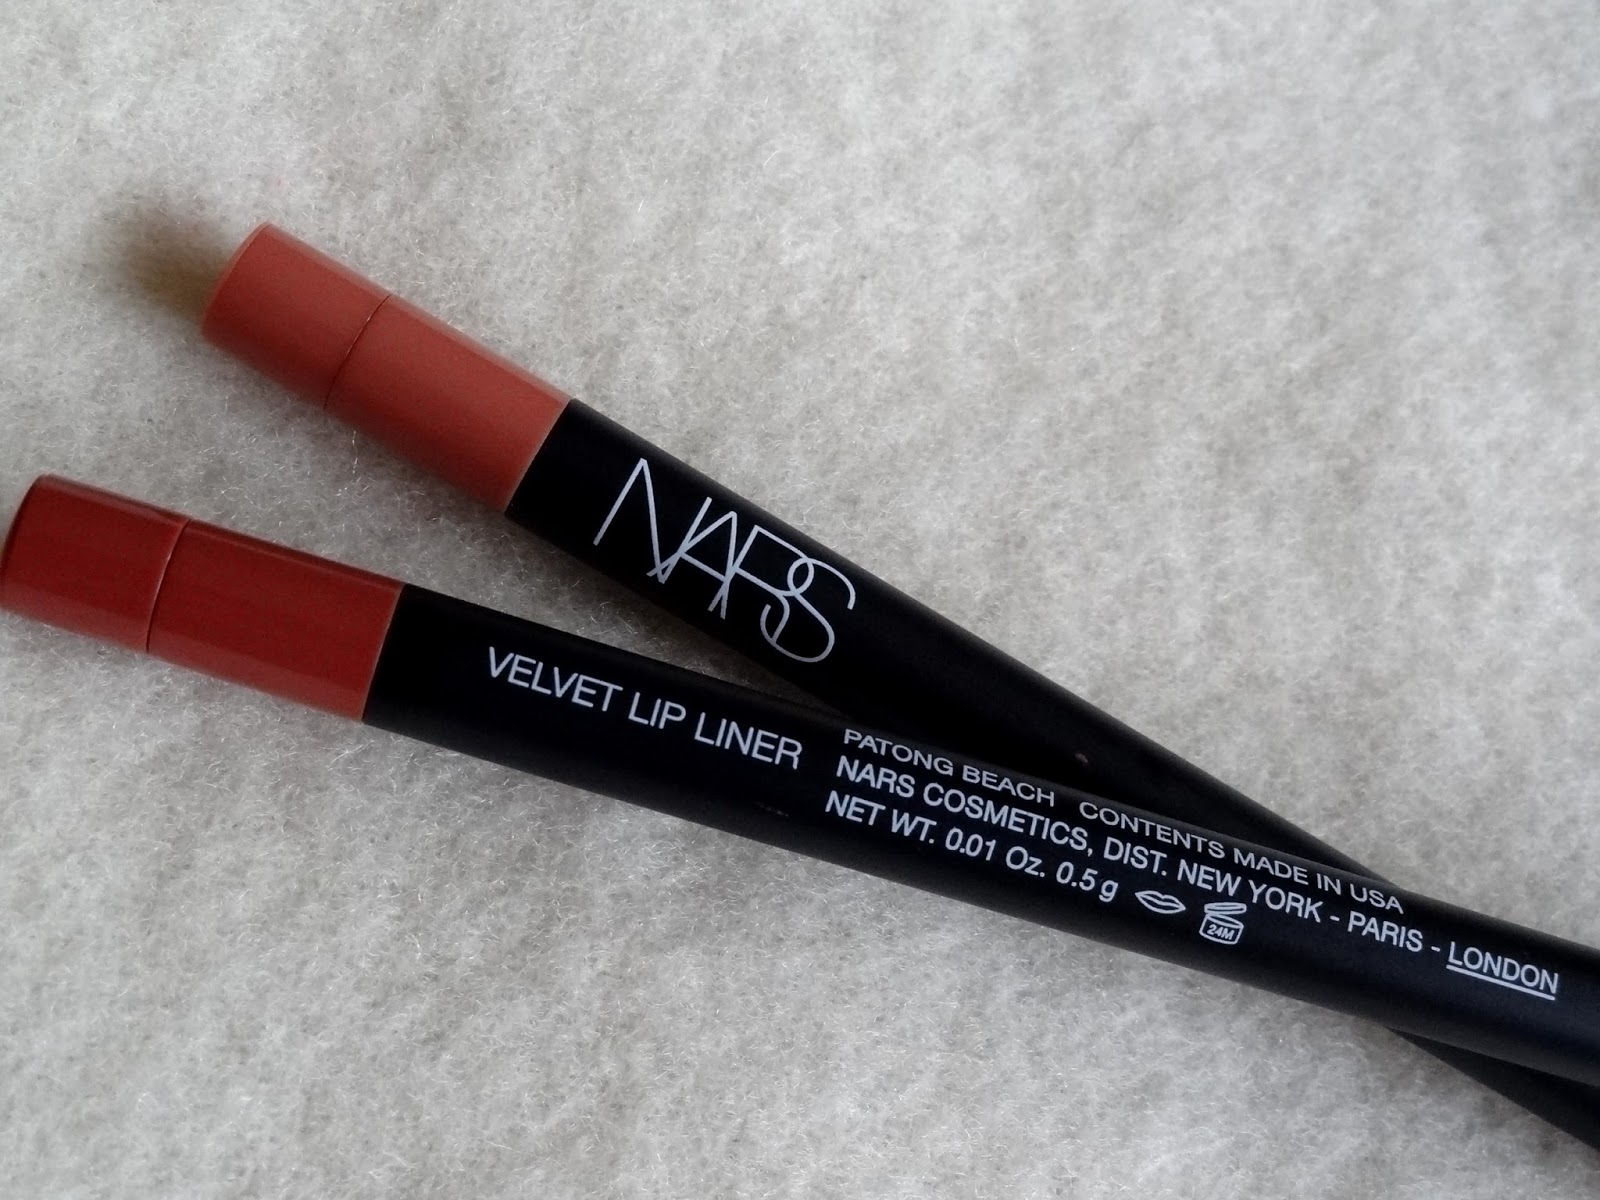 NARS Velvet Lip Liners Waimea and Patong Beach Review, Photos